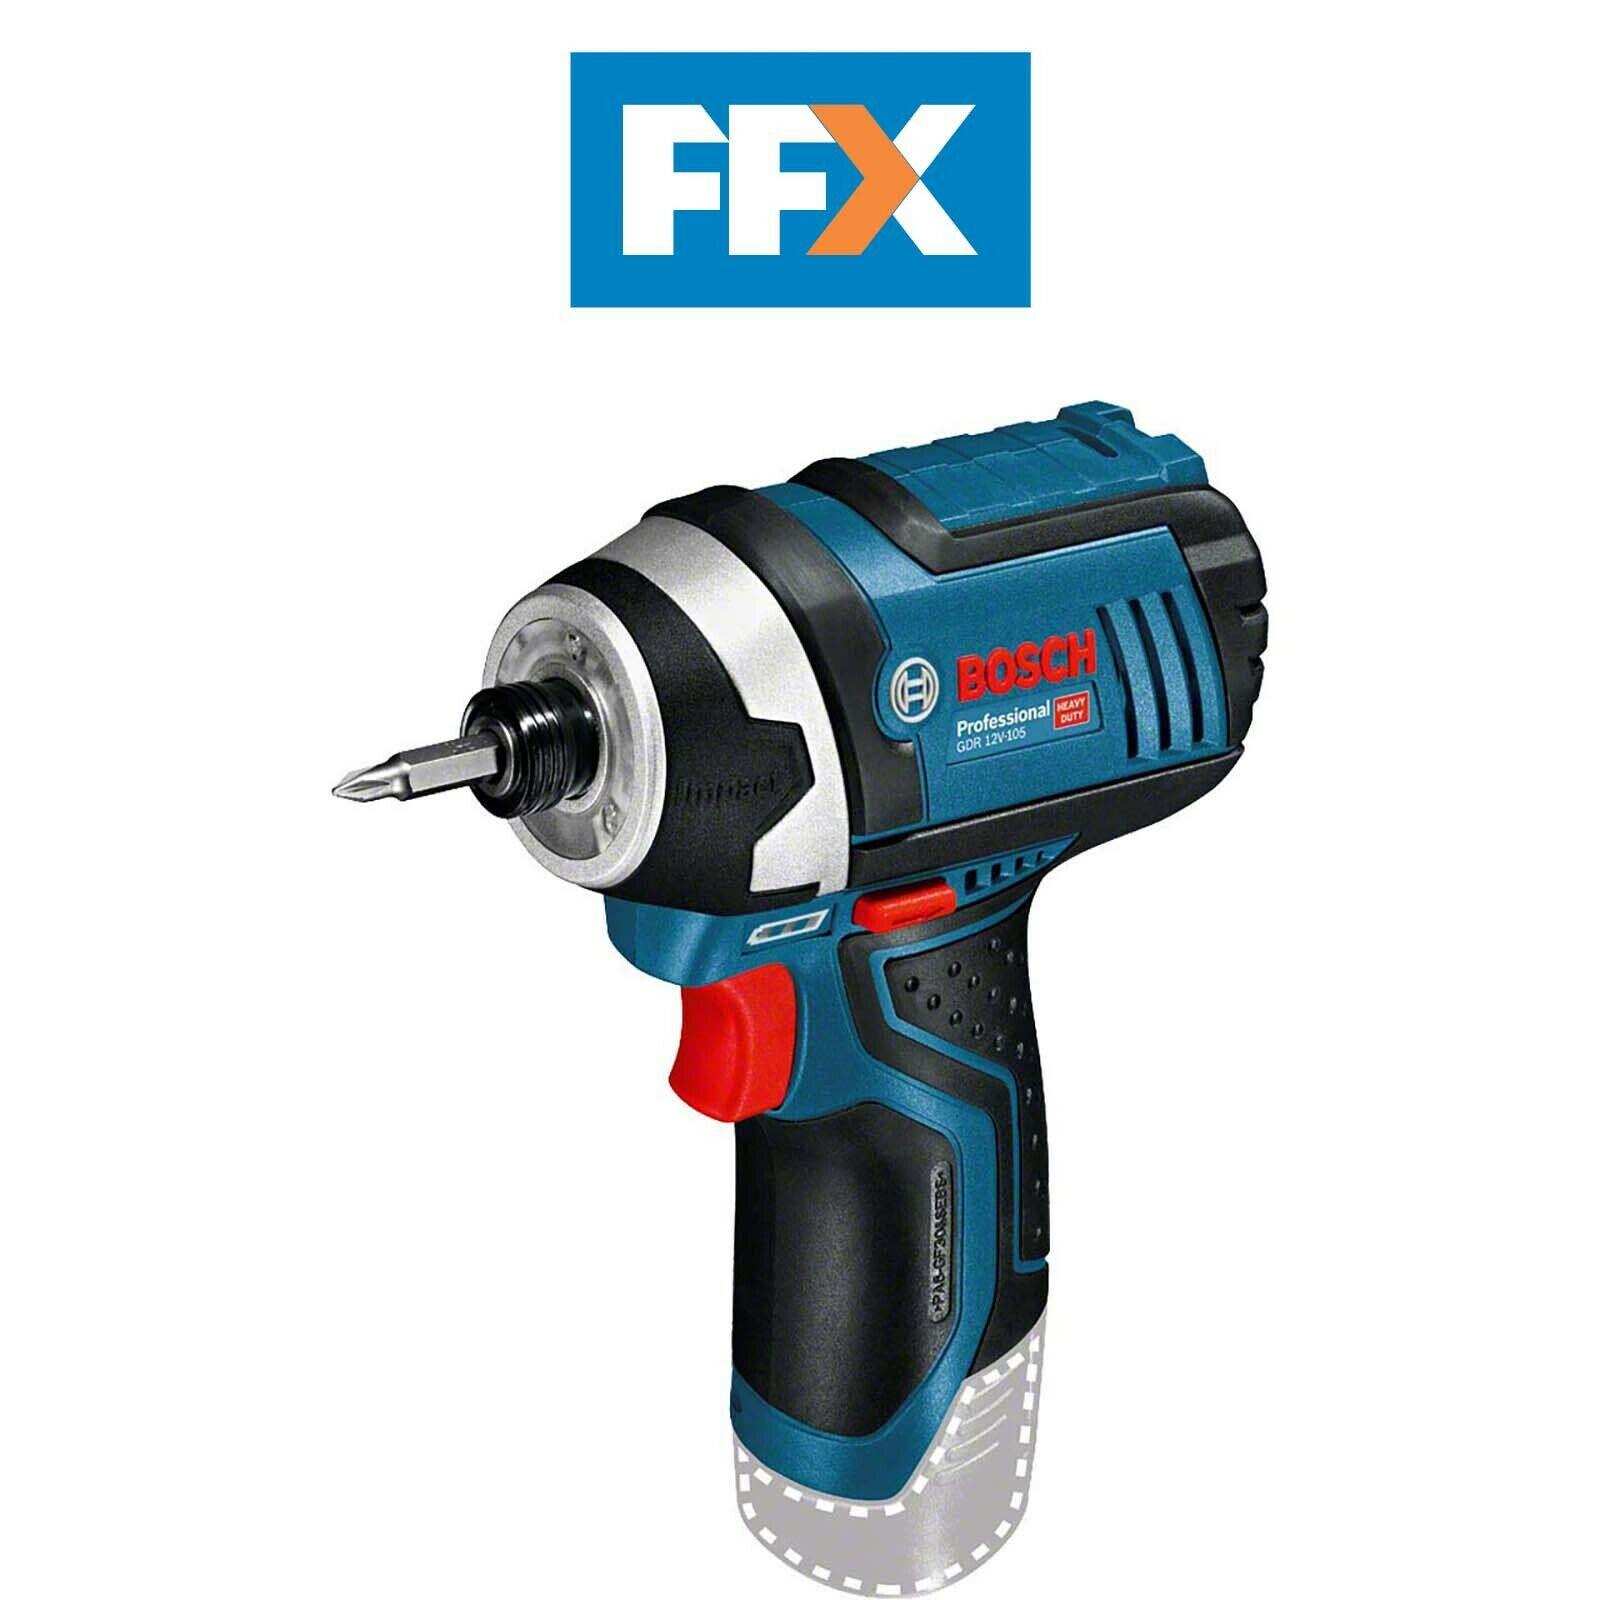 Bosch GDR12V105N 12v Cordless Impact Driver Bare Unit £46.92 @ FFX Ebay